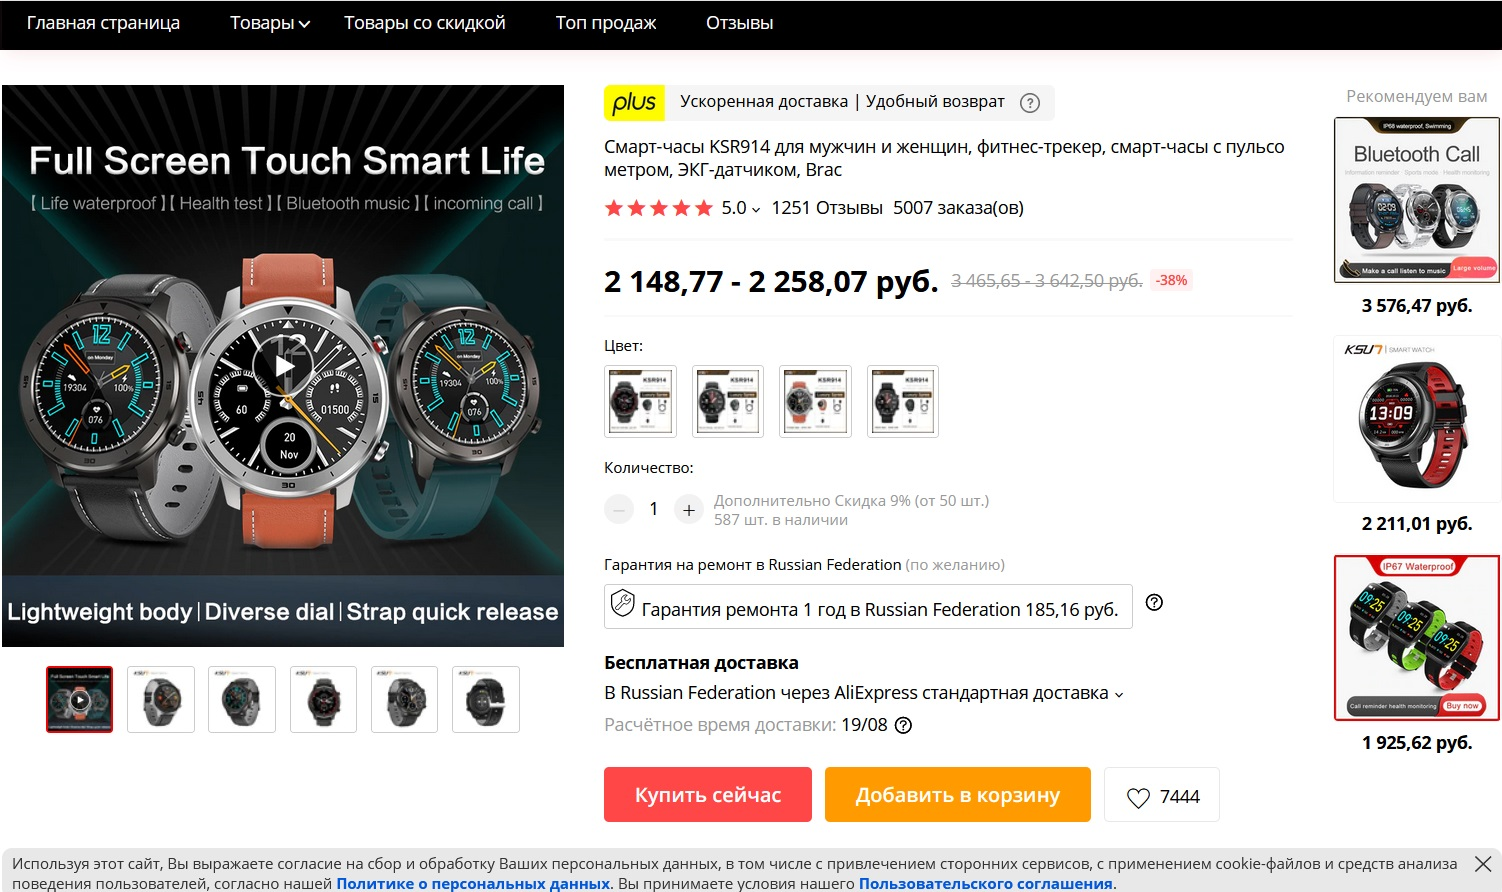 Смарт-часы KSUN KSR914